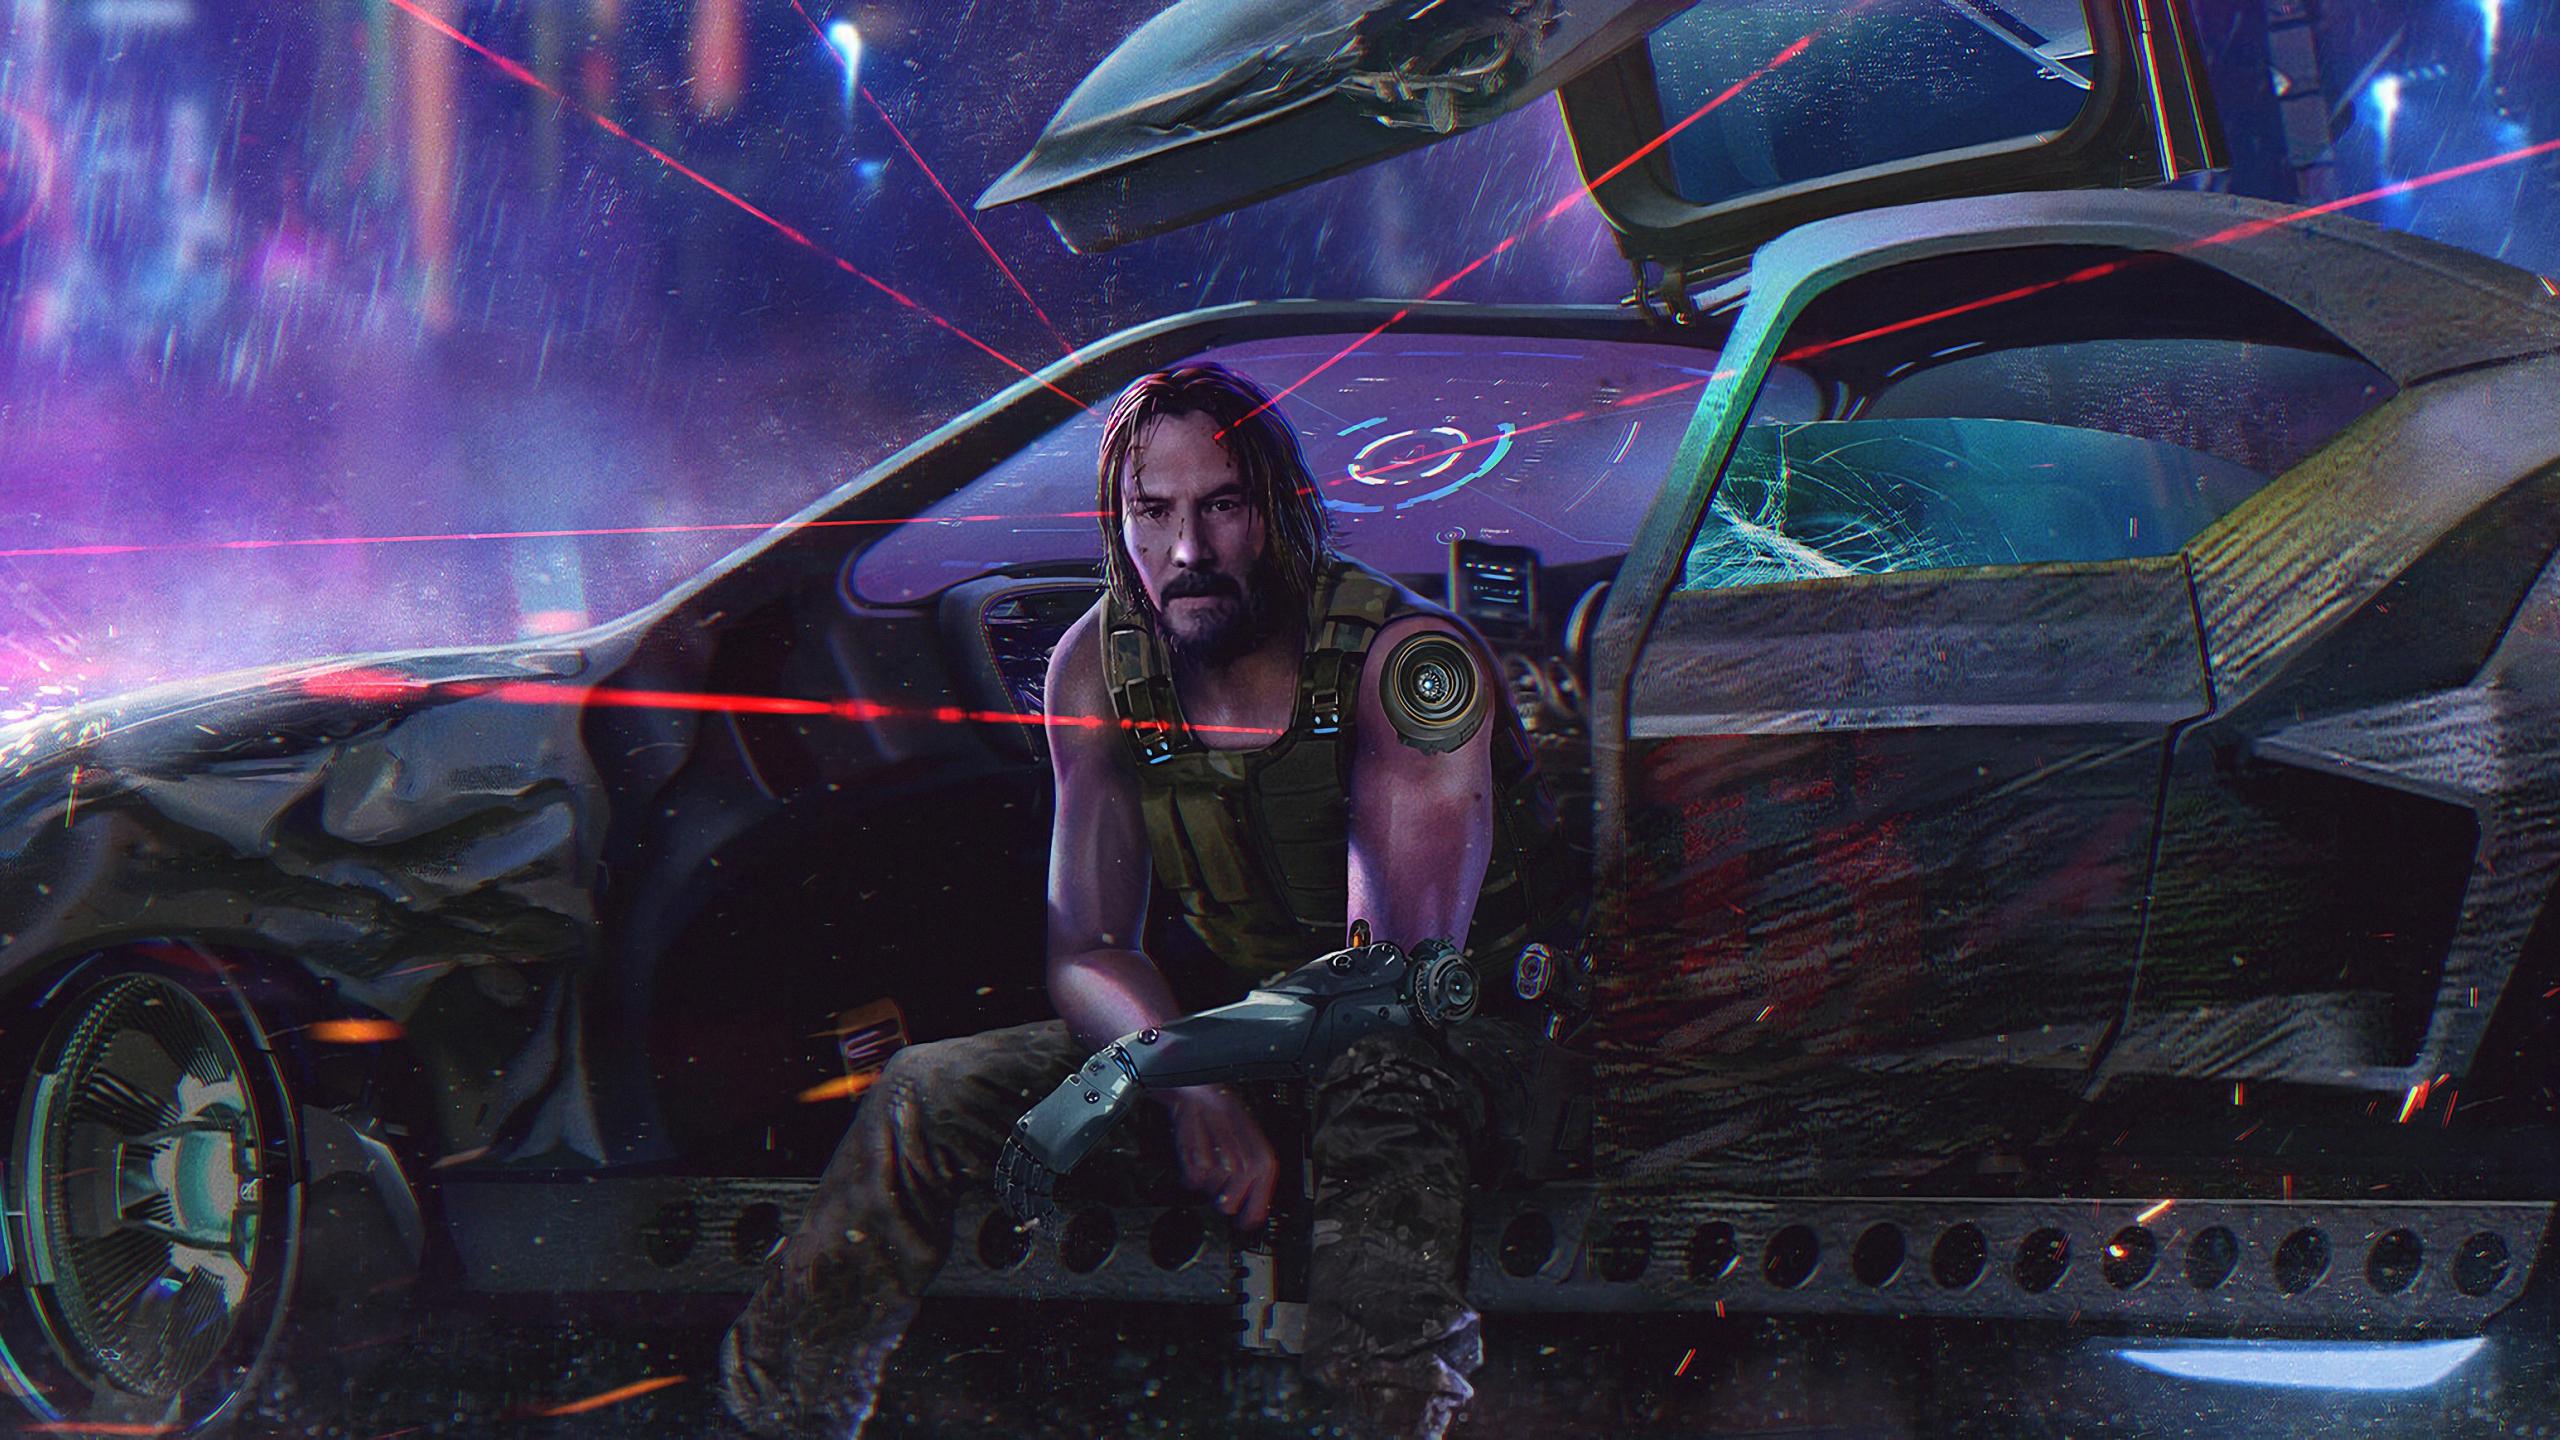 Download 2560x1440 Wallpaper Cyberpunk 2077 Keanu Reeves Video Game 2019 Dual Wide Widescreen 16 9 Widescreen 2560x1440 Hd Image Background 22156